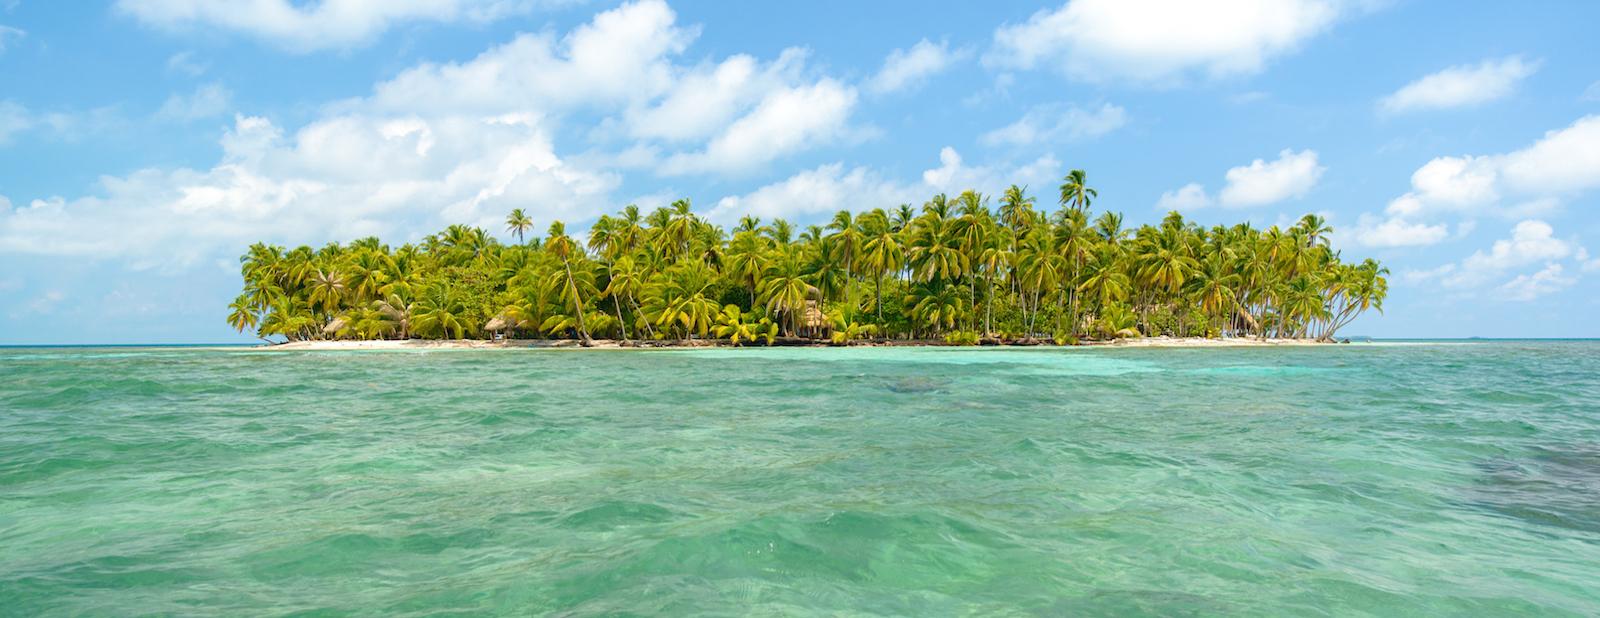 The 3 seas of Nicaragua